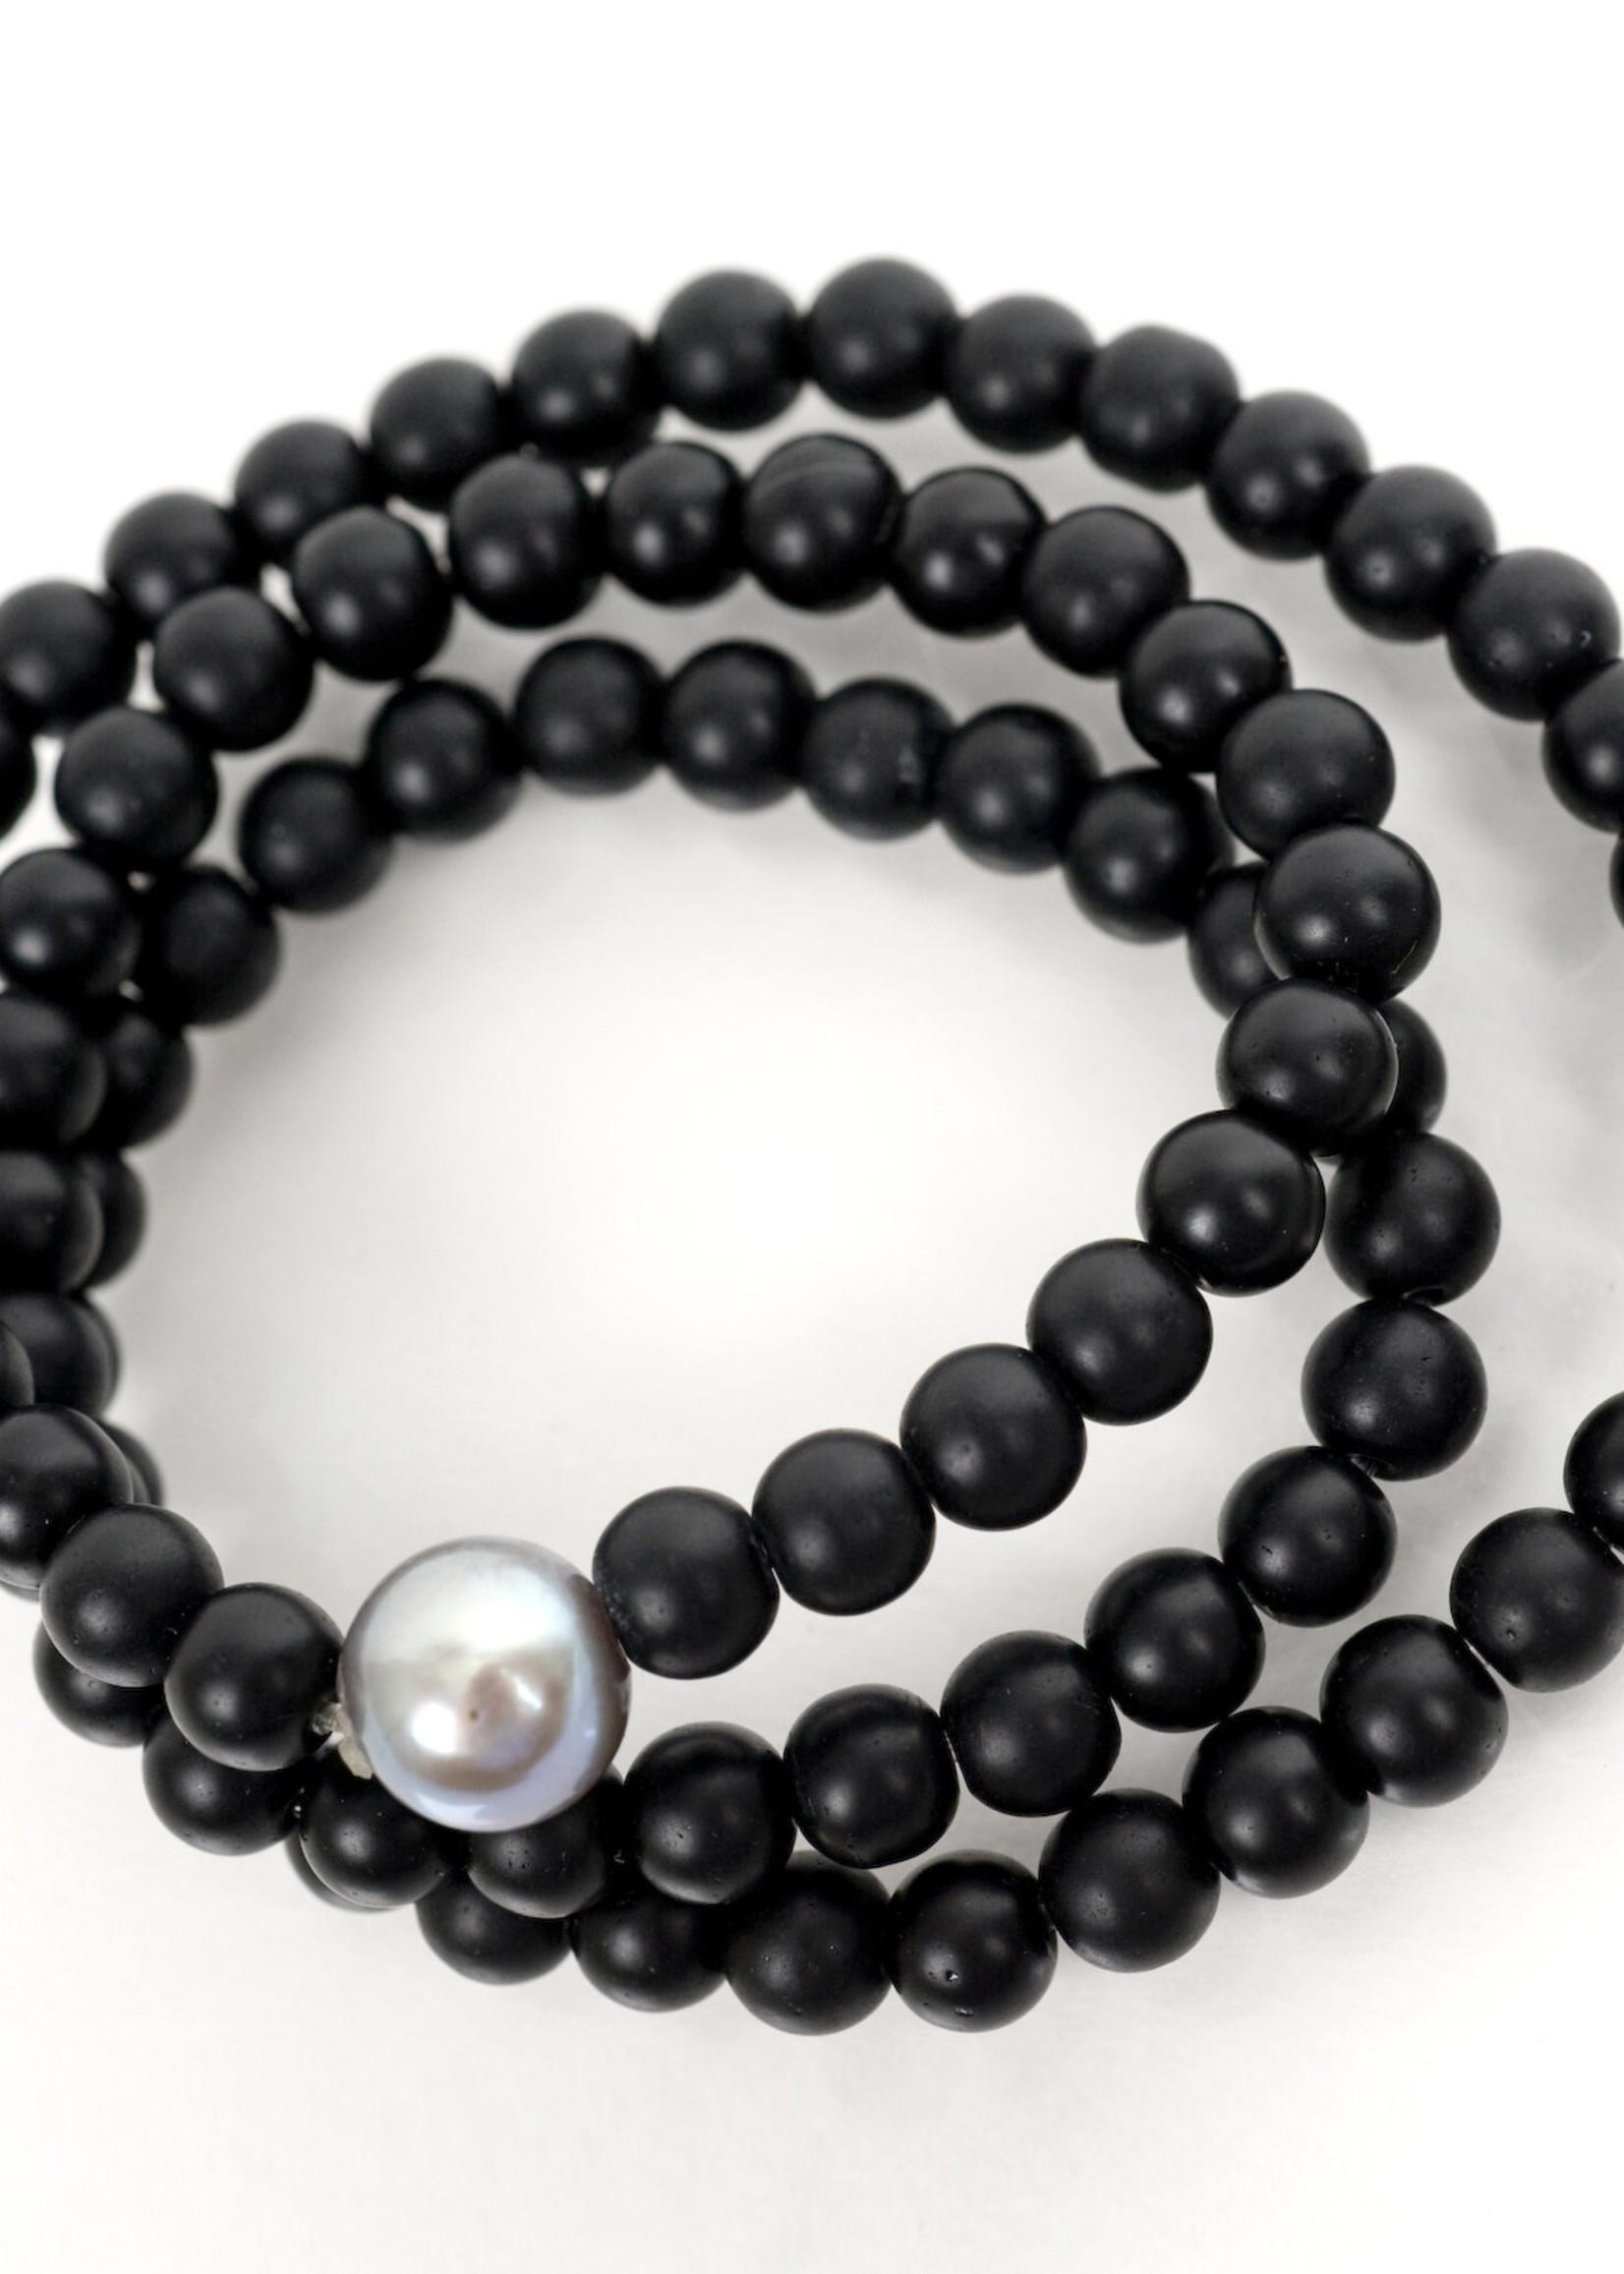 Mina Danielle Black Onyx Wrap with Small Gray Pearl